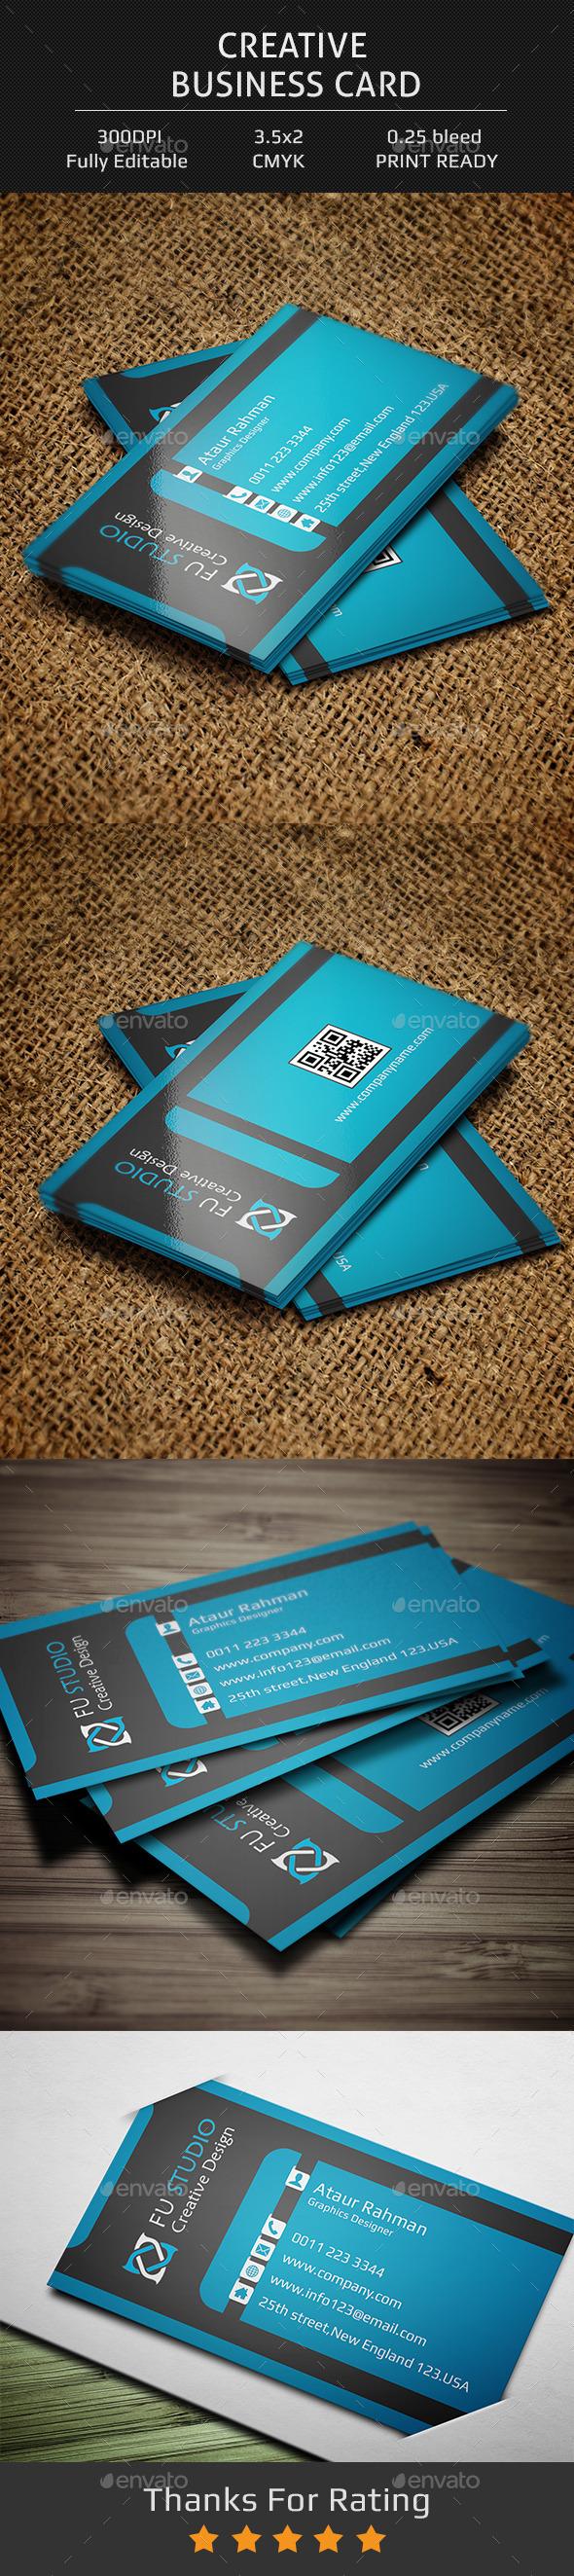 Creative Business Card V6 - Creative Business Cards